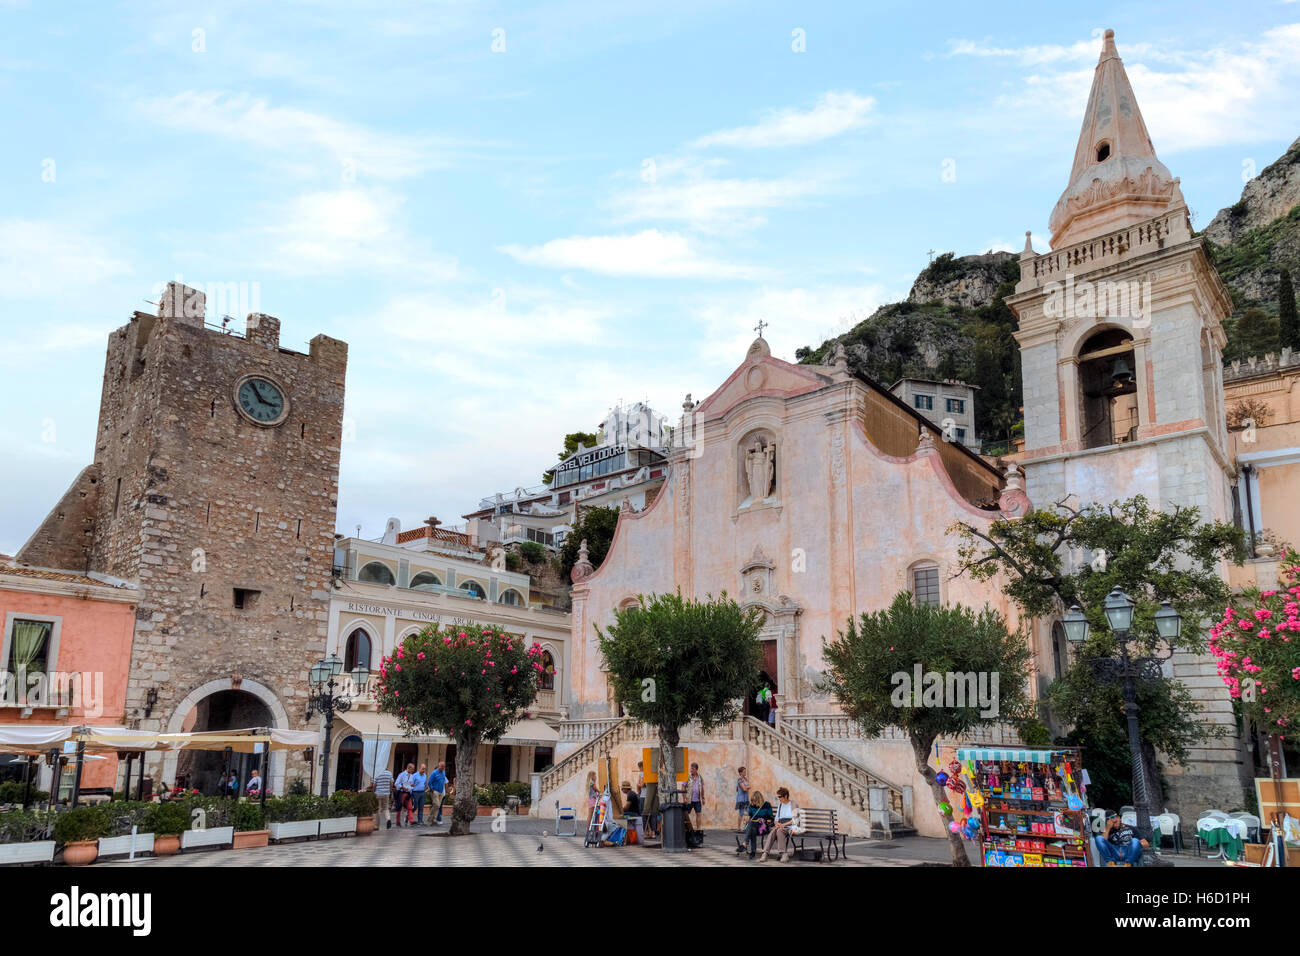 Piazza IX Aprile, Taormina, Sicily, Italy - Stock Image